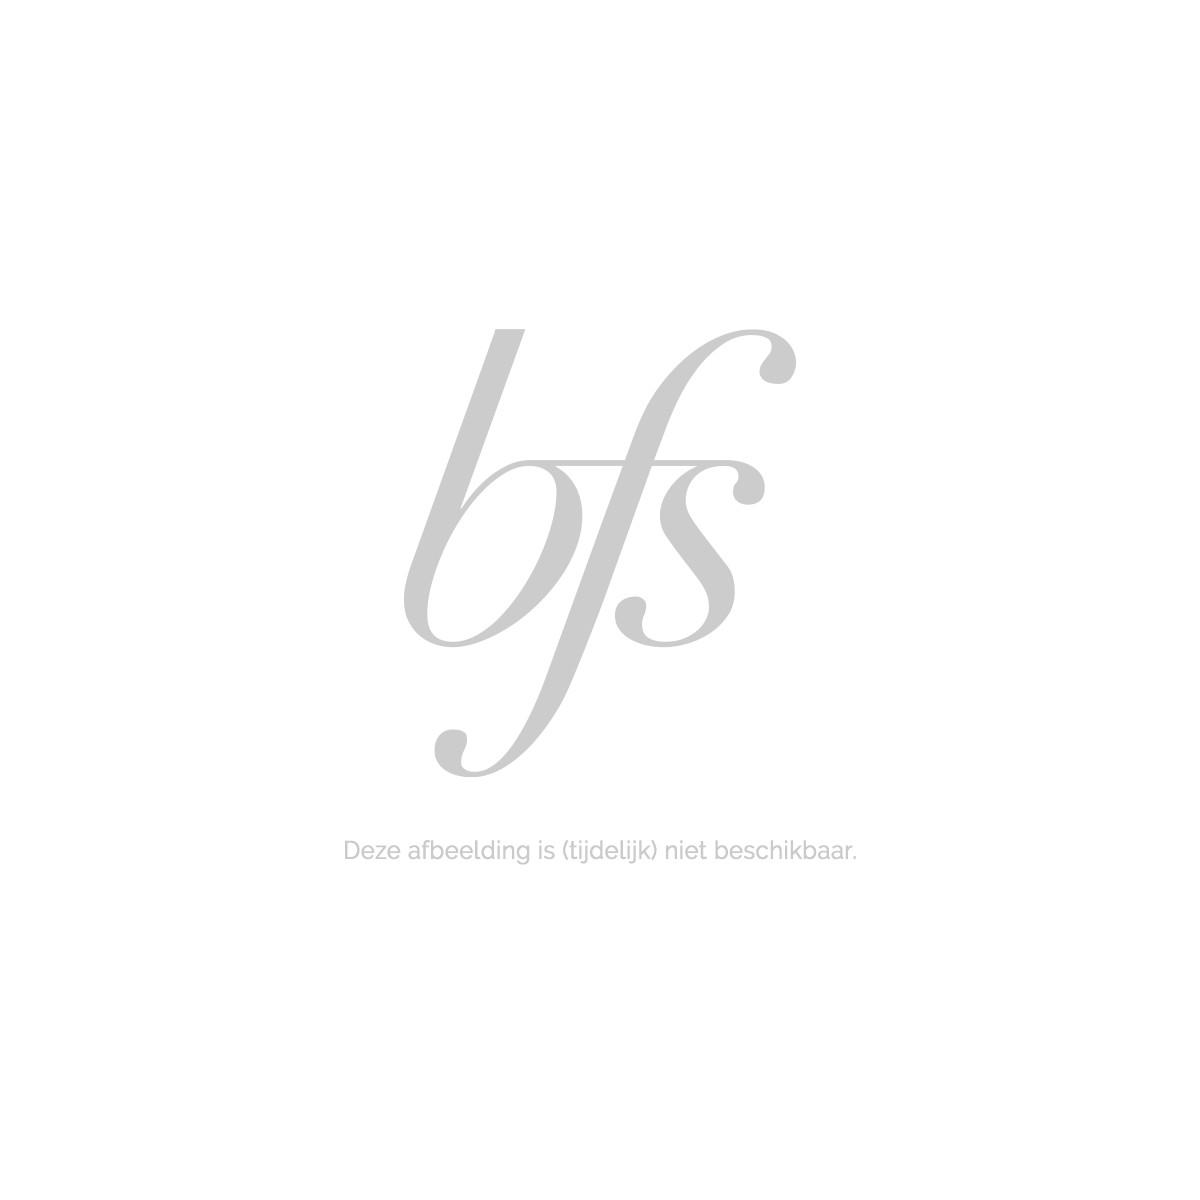 Beardburys T-Blade Detailer Trimmer